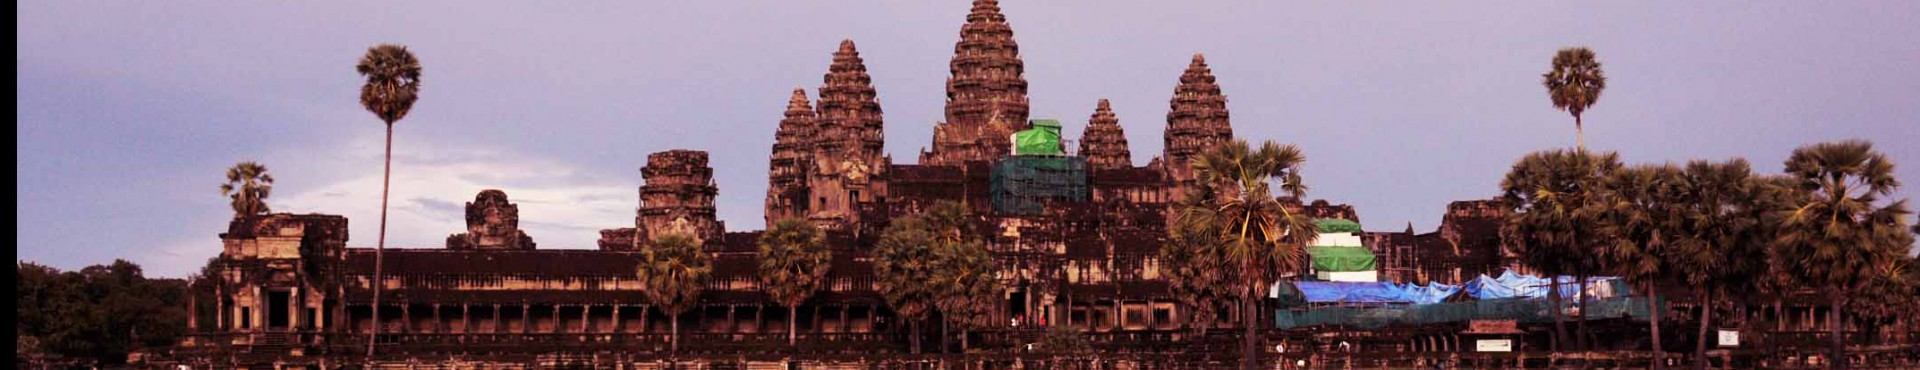 Thailandia e Cambogia 2008